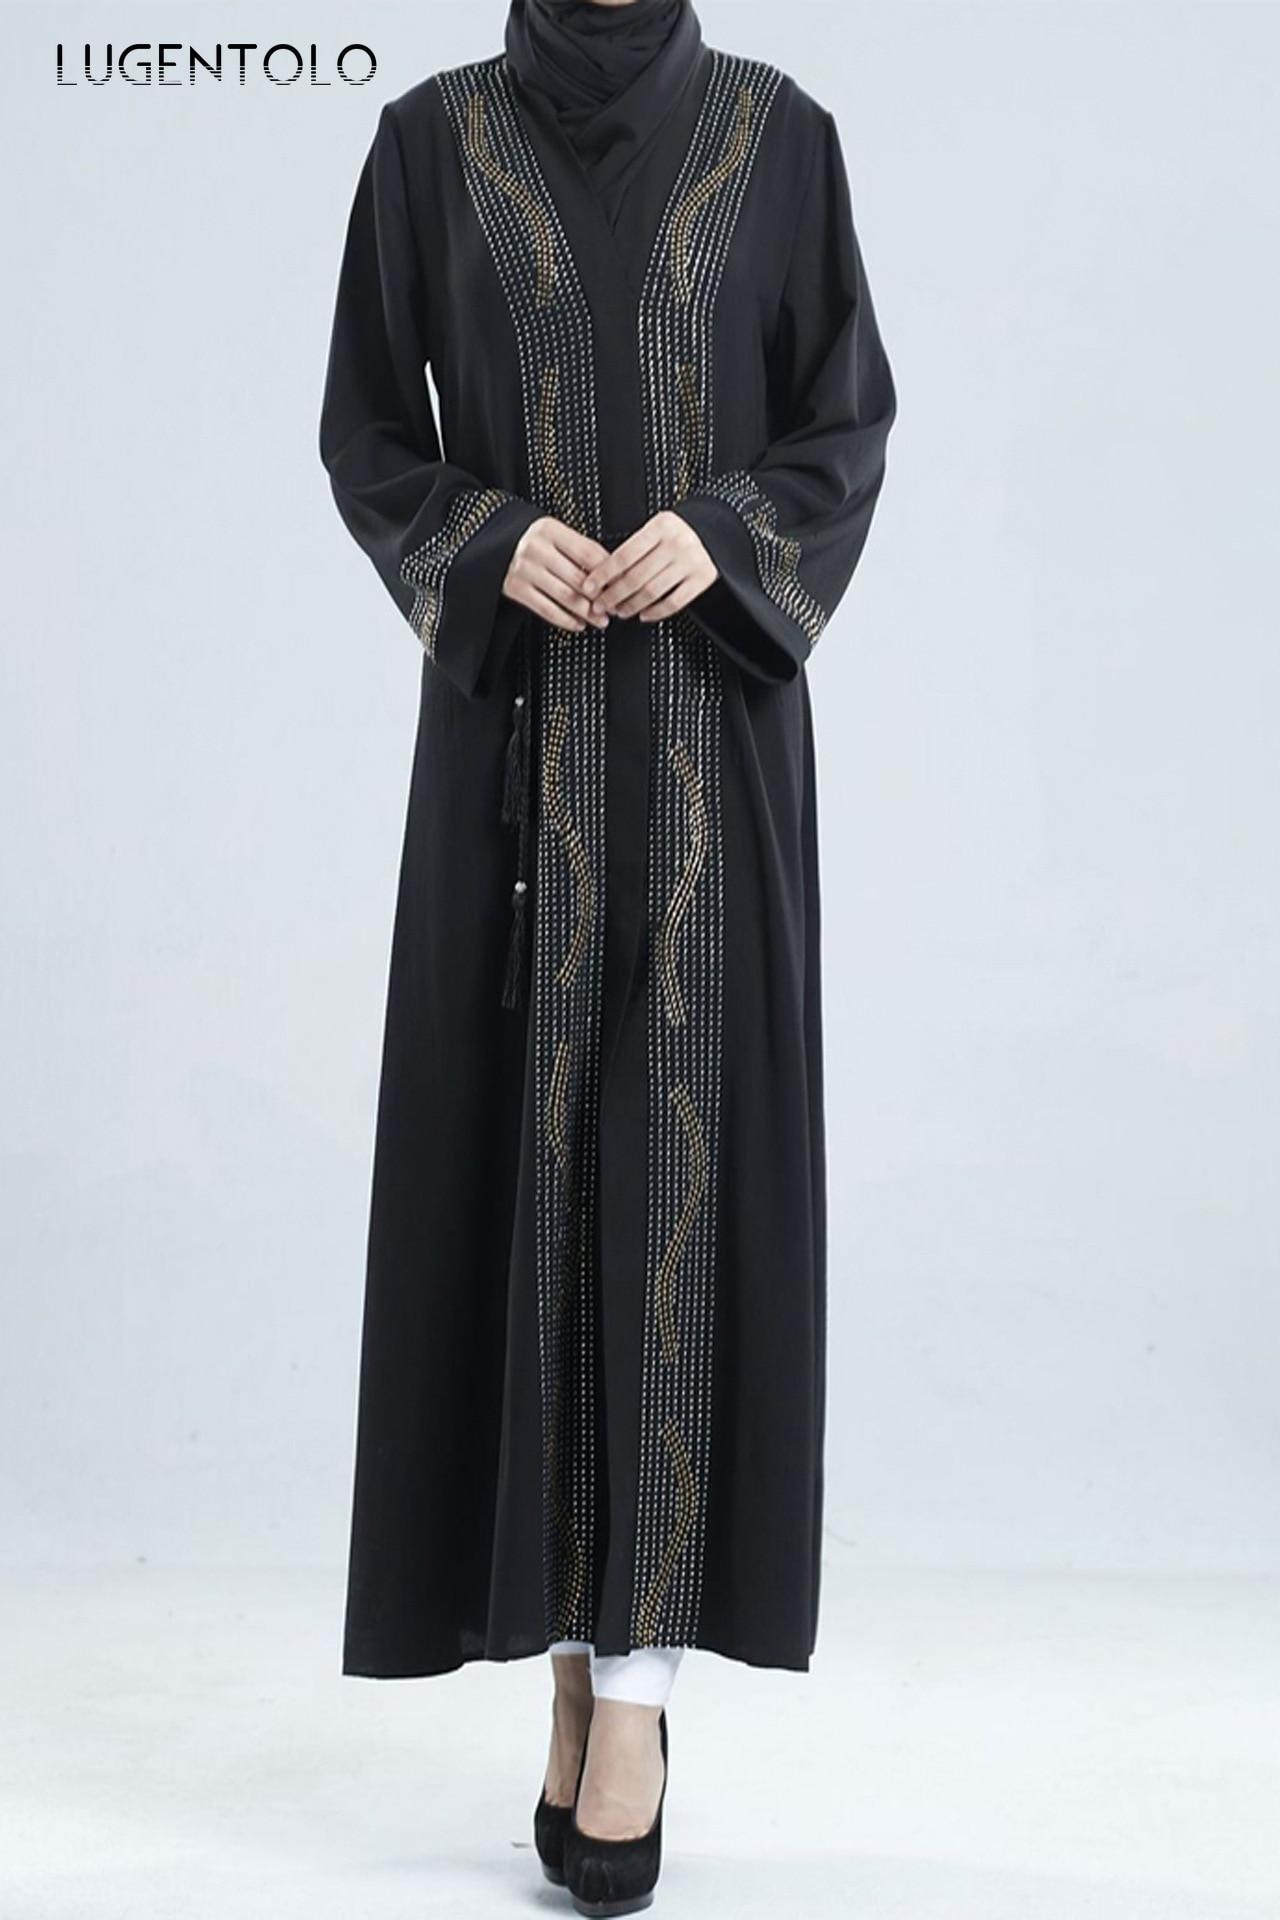 Lugentolo Women Vintage Dress Loose Hot Drilling New Fashion Muslim V-neck Cardigan Big Swing Dress Abaya Lady Casual Maxi Dress